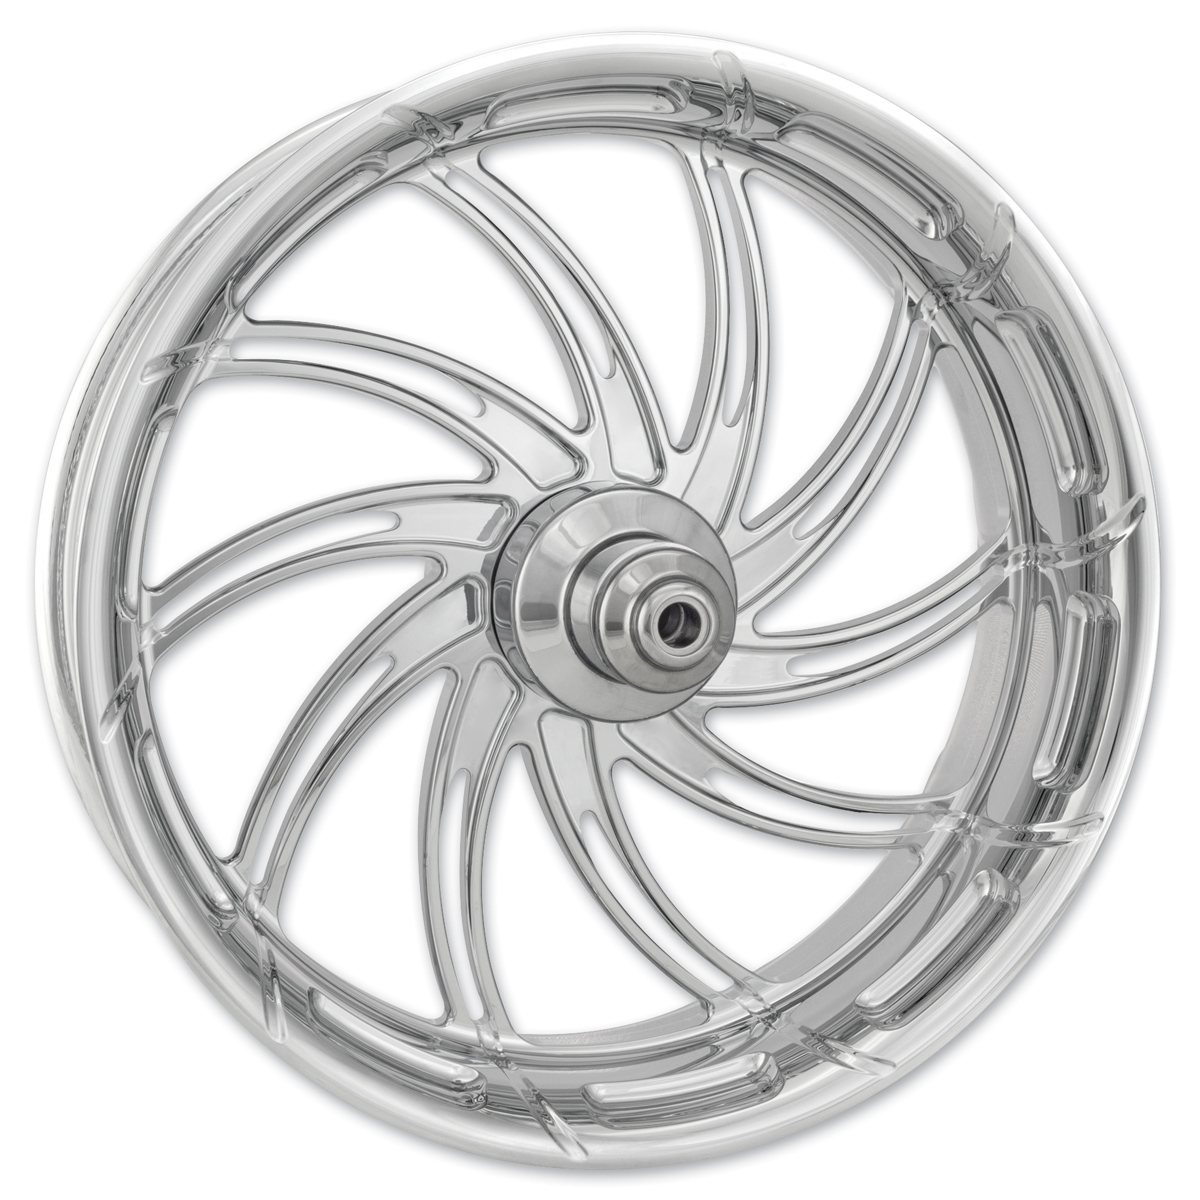 Performance Machine Supra Chrome Front Wheel 21x3.5 Dual disc